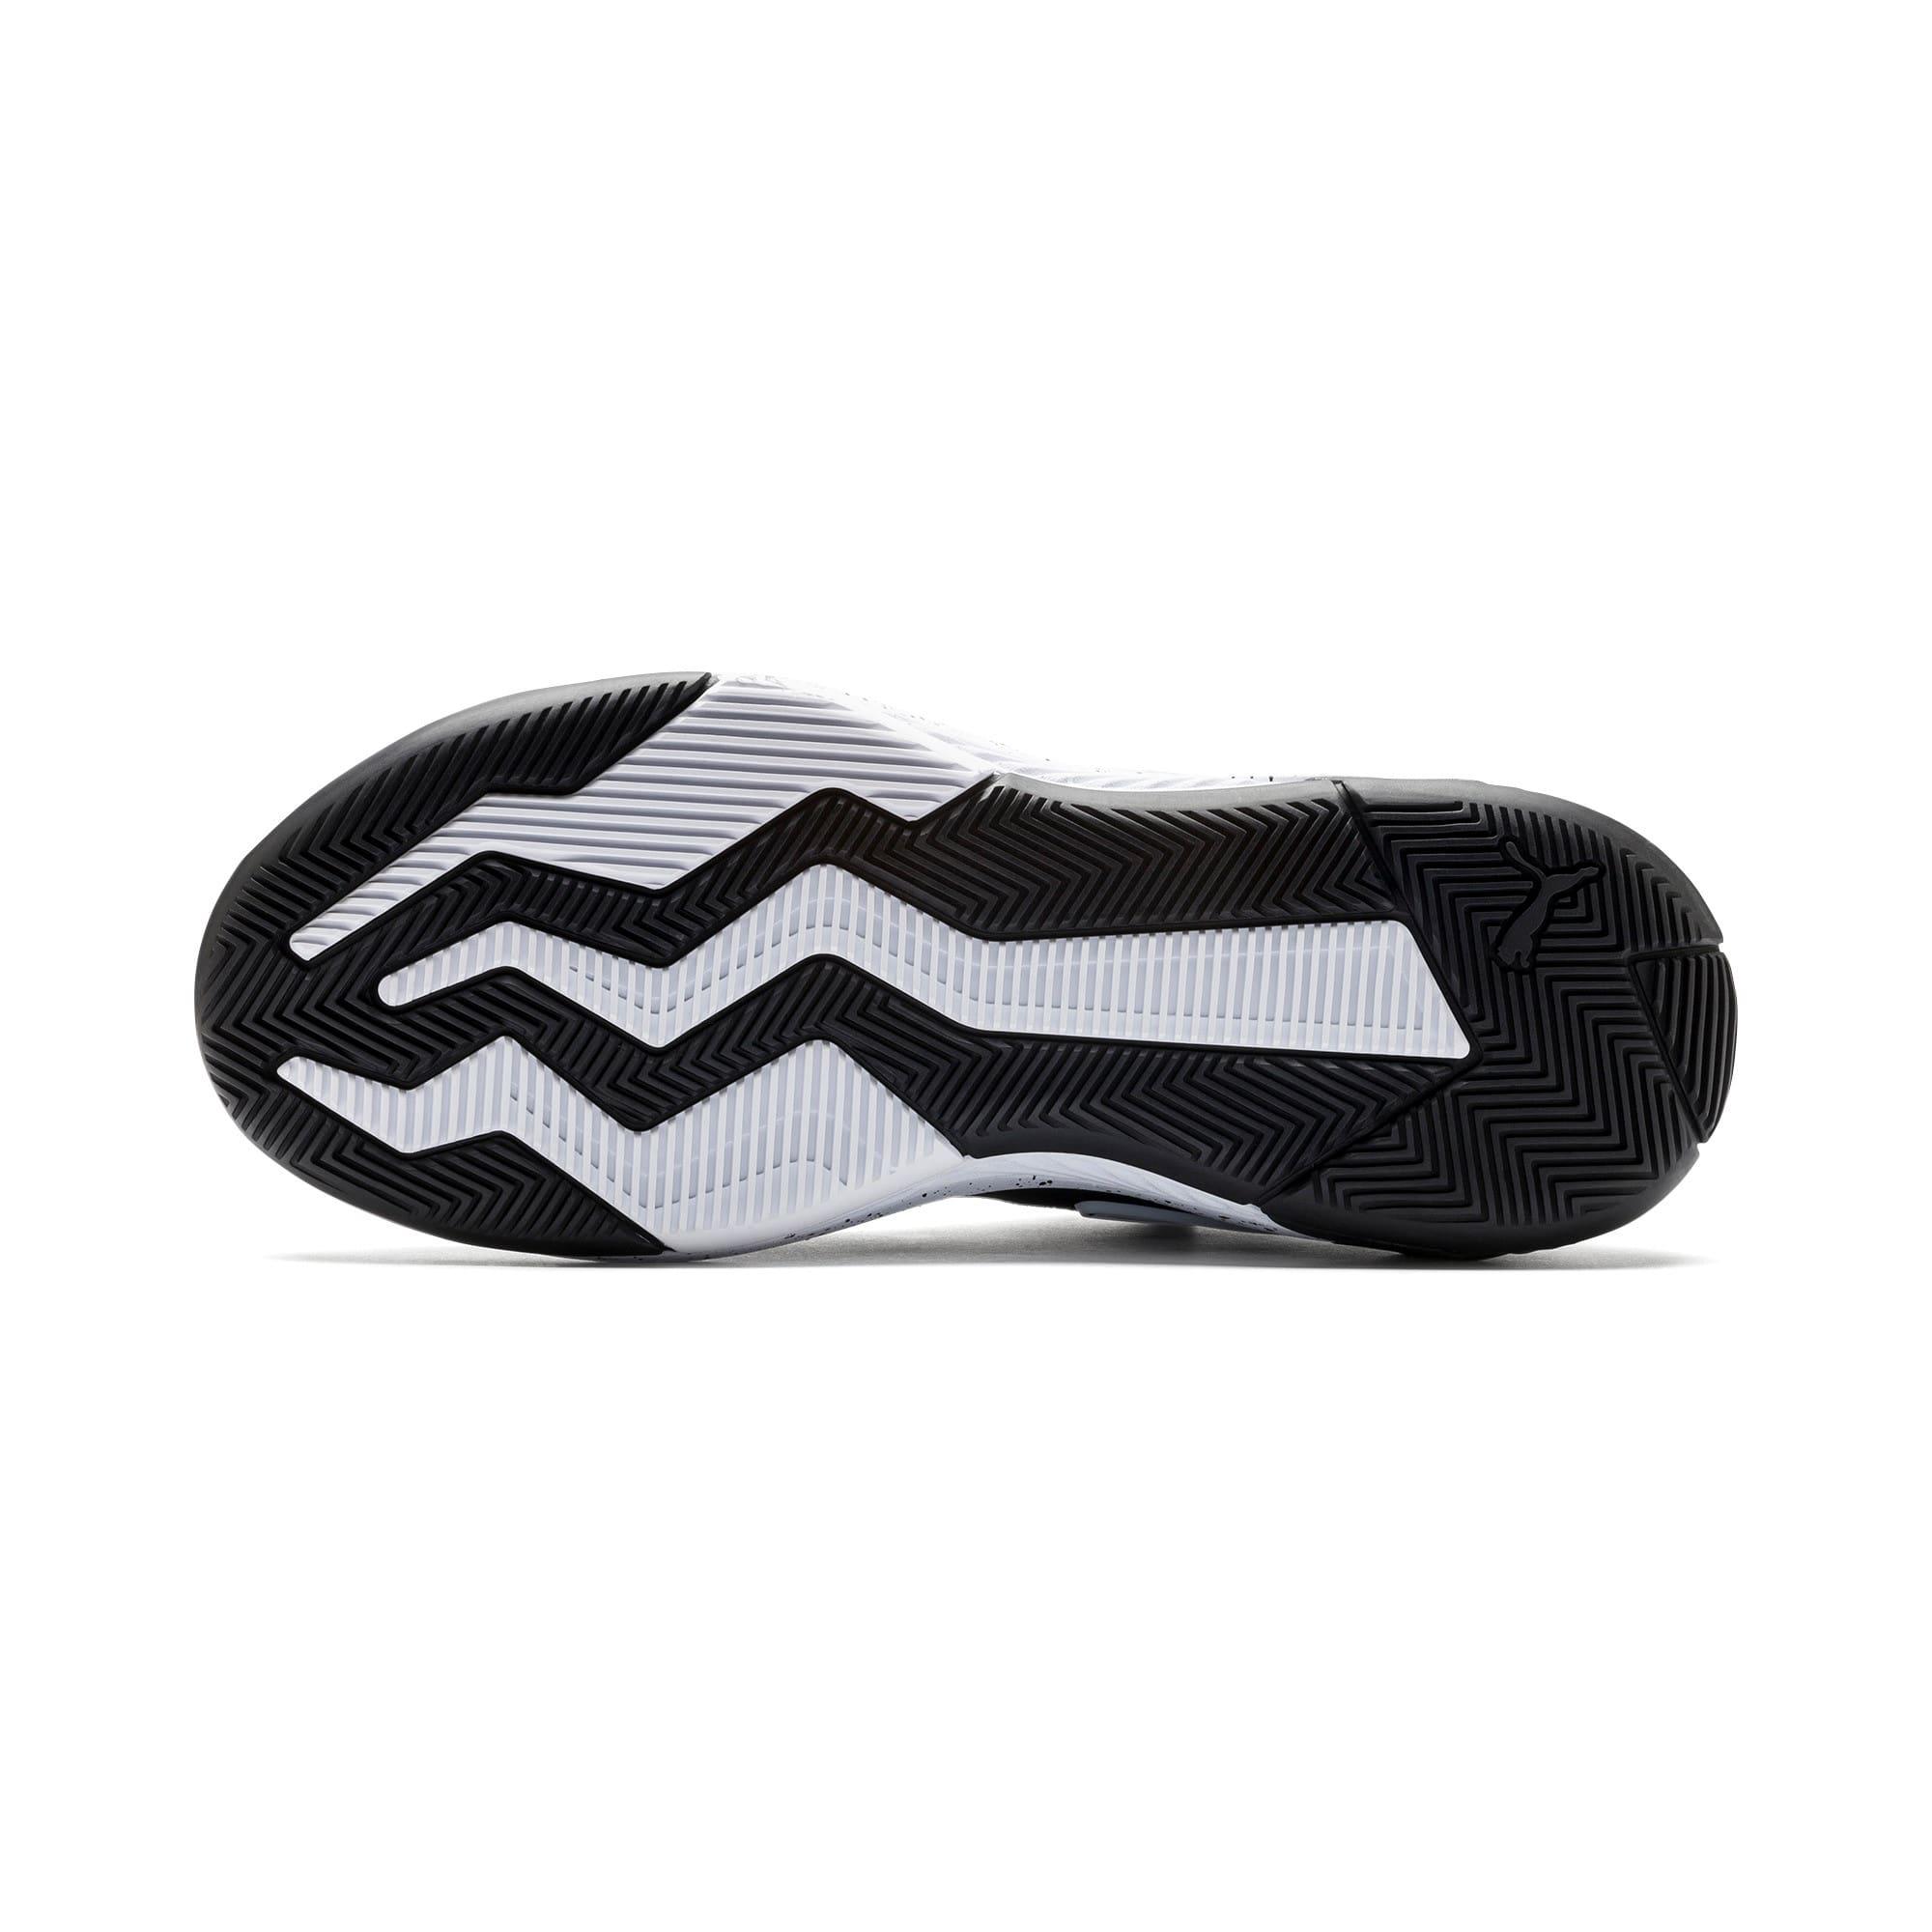 Thumbnail 4 of Uproar Core Basketball Shoes, Puma Black, medium